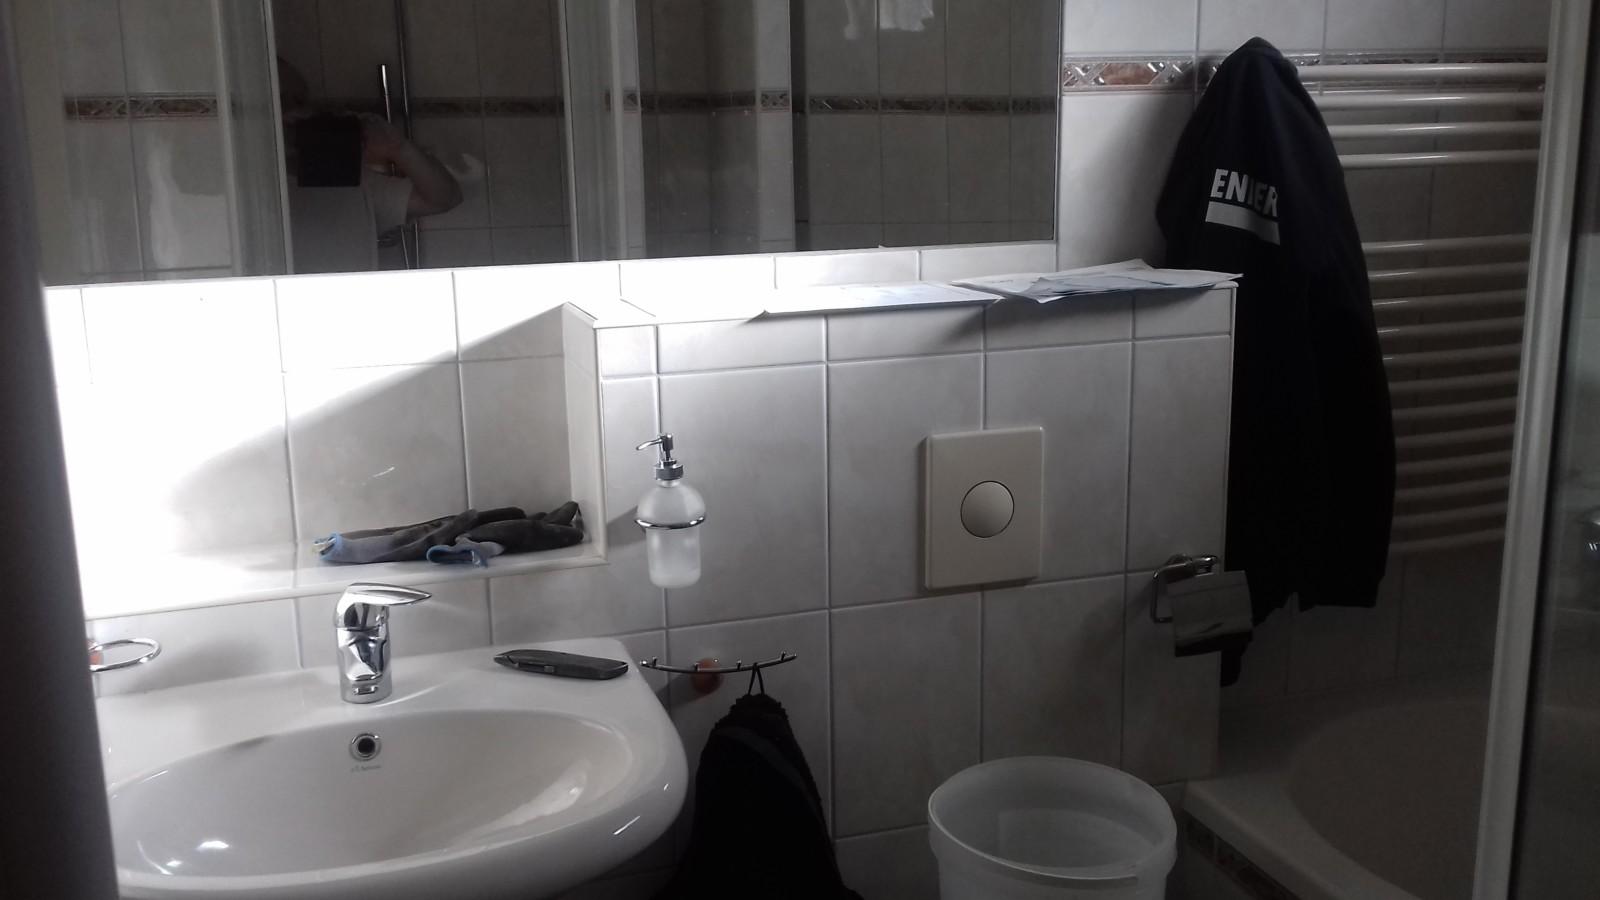 Toilet Renovatie Kosten : Badkamer en toilet renovatie zwolle de klussenier wout hansman